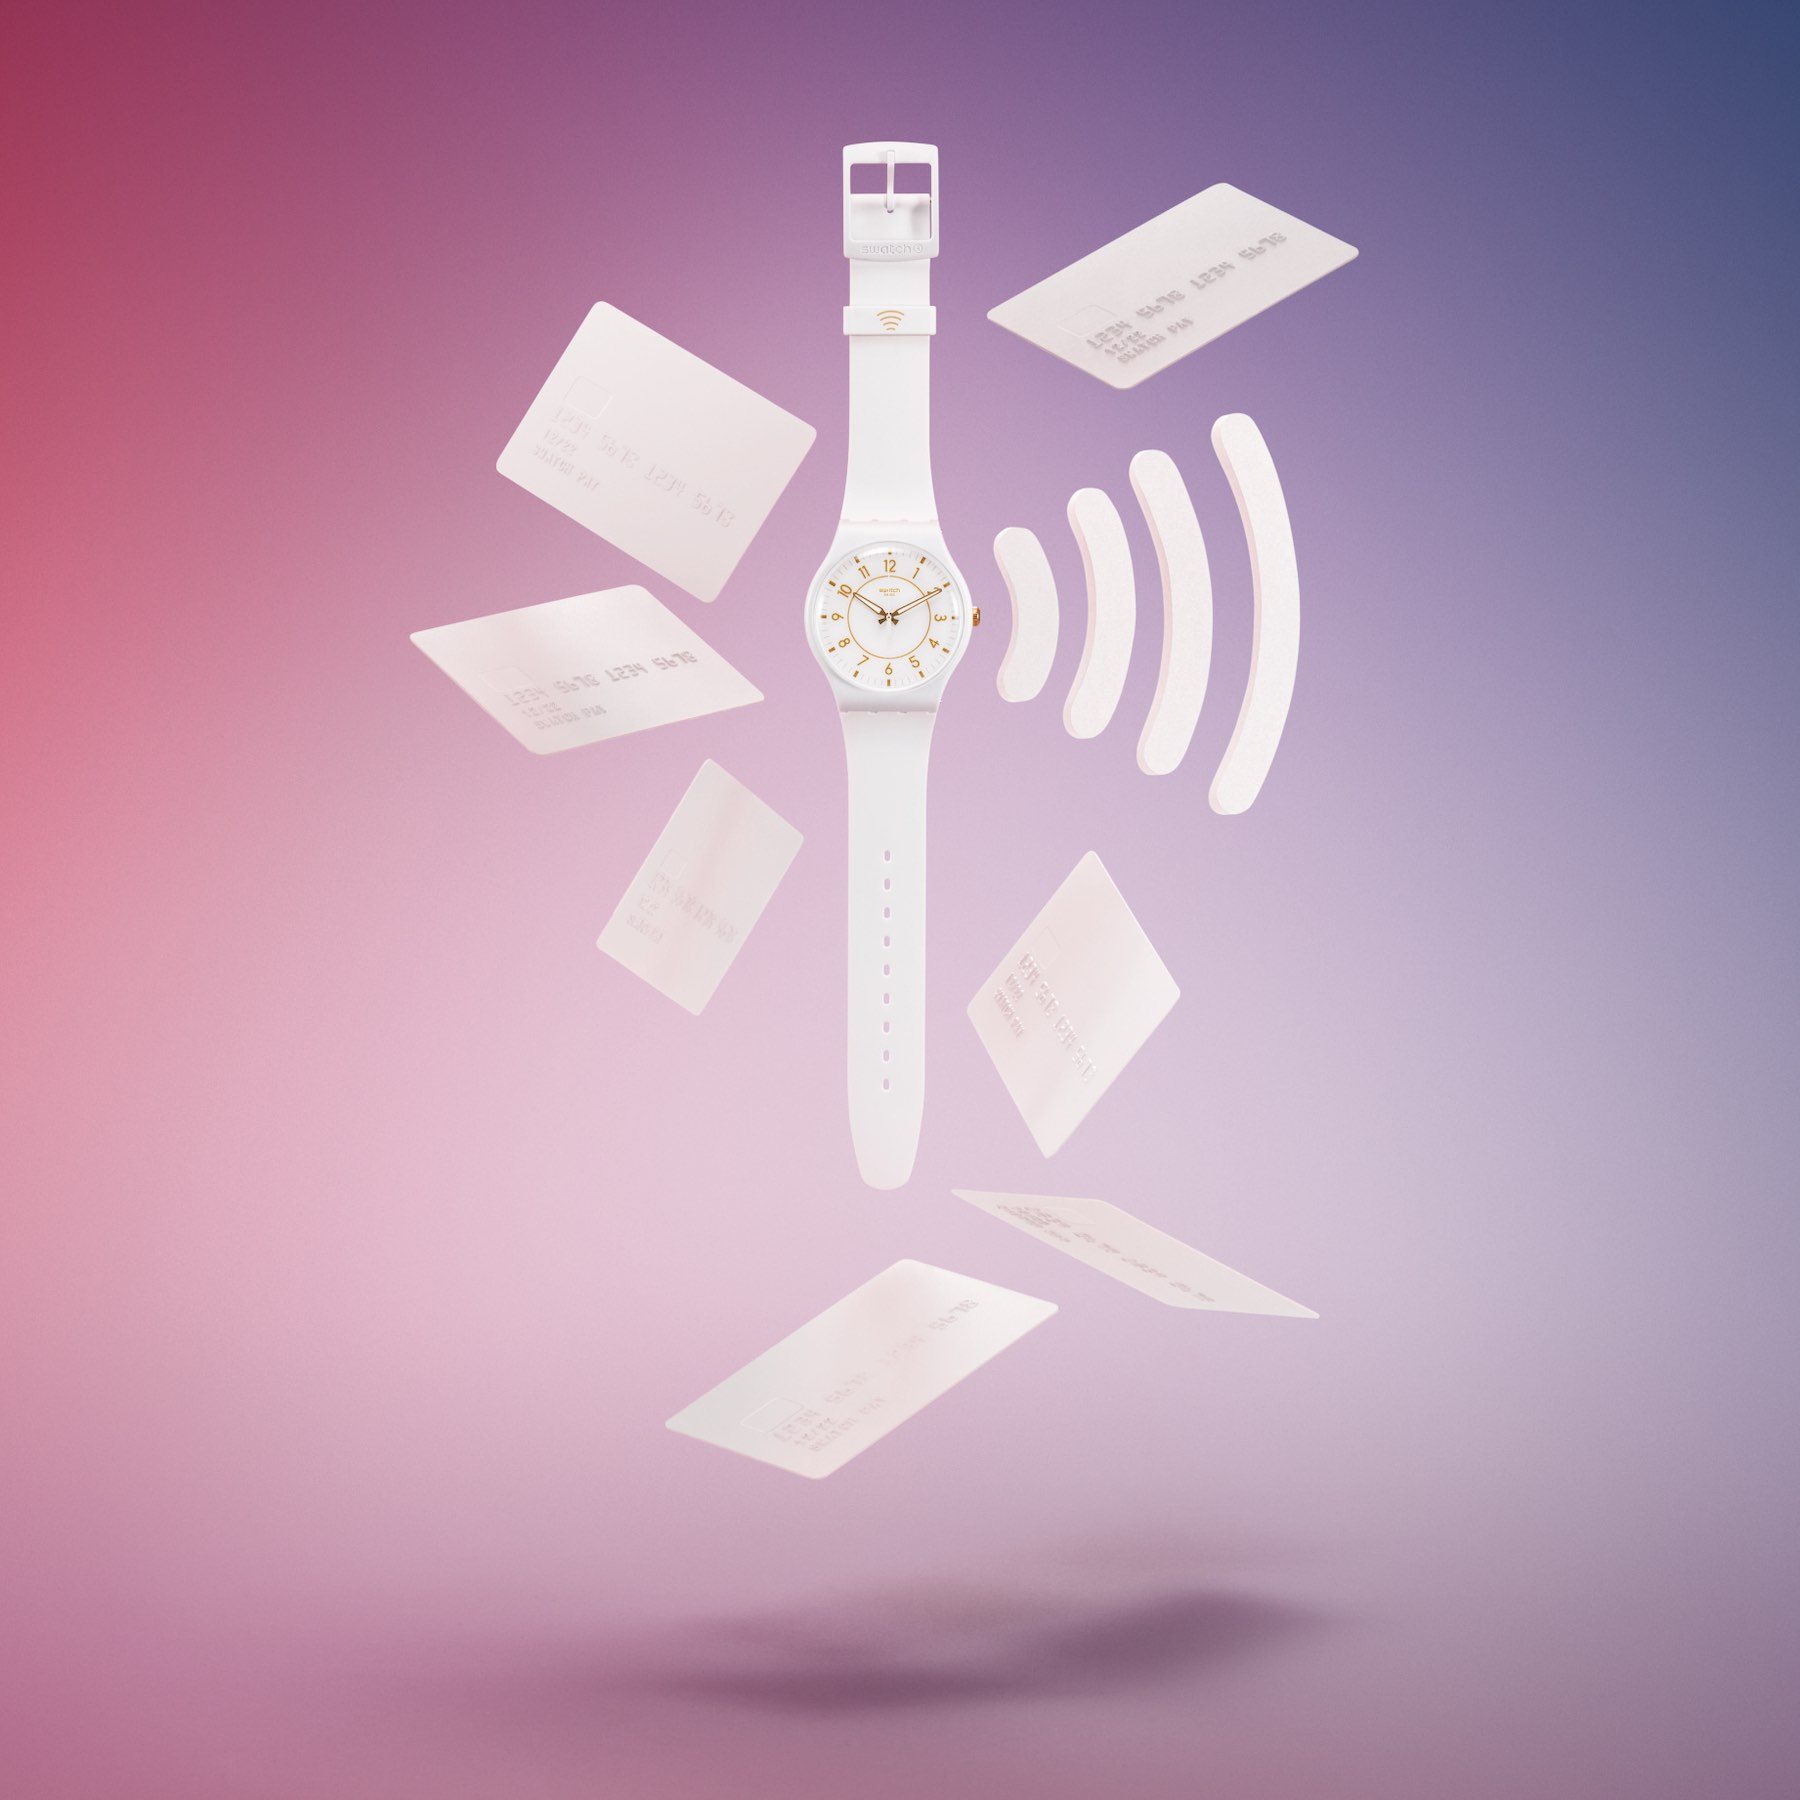 Paiement SwatchPAY NFC